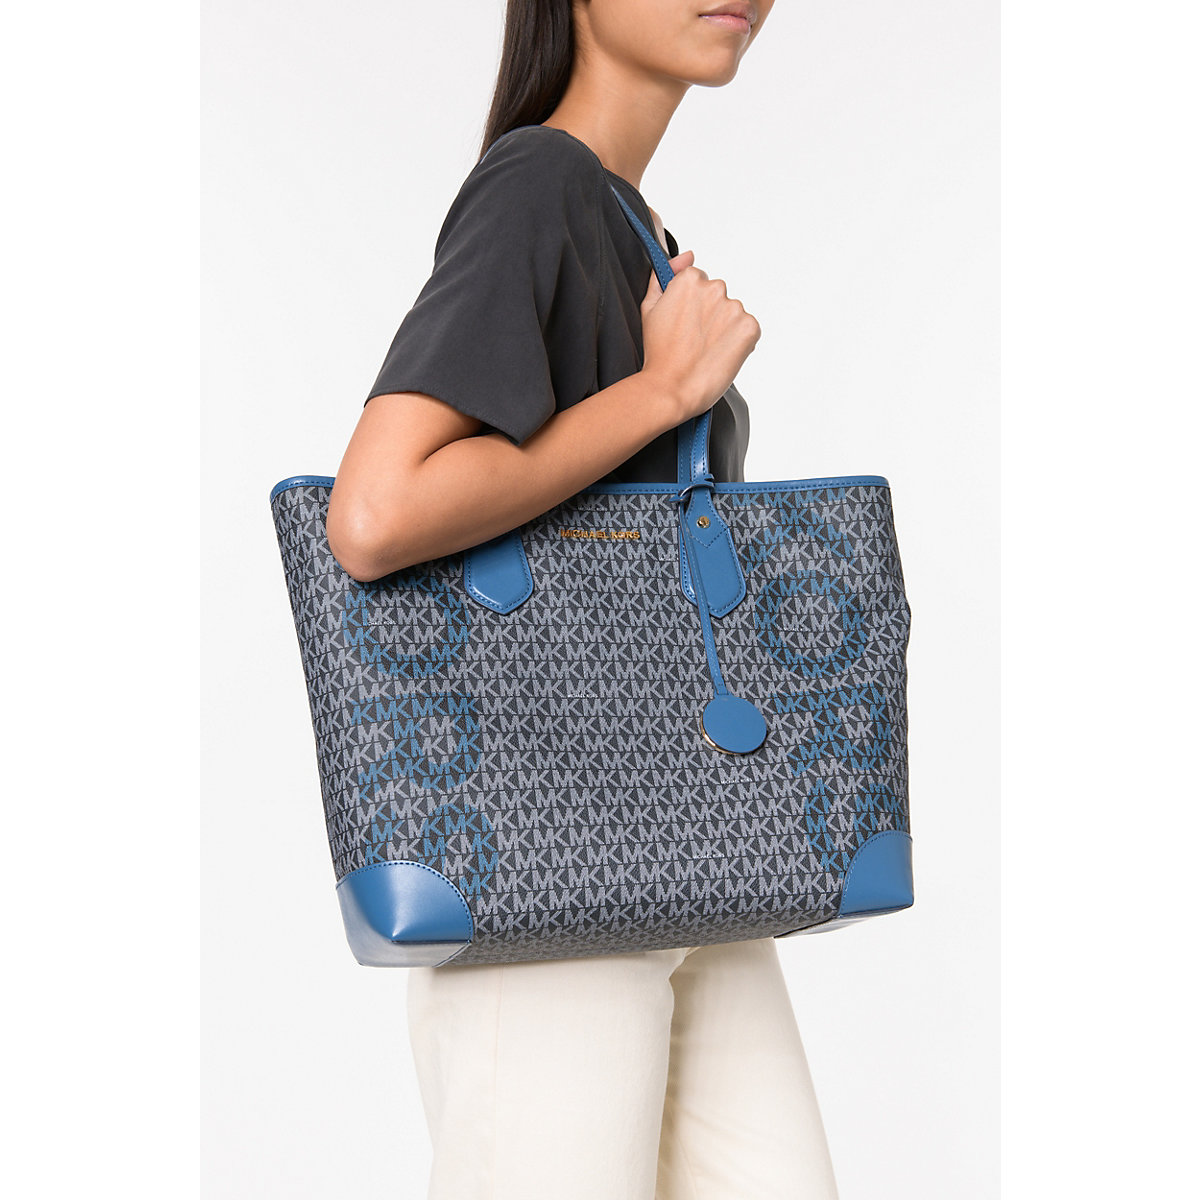 Michael Kors, Bag Tote Handtasche, Blau-kombi